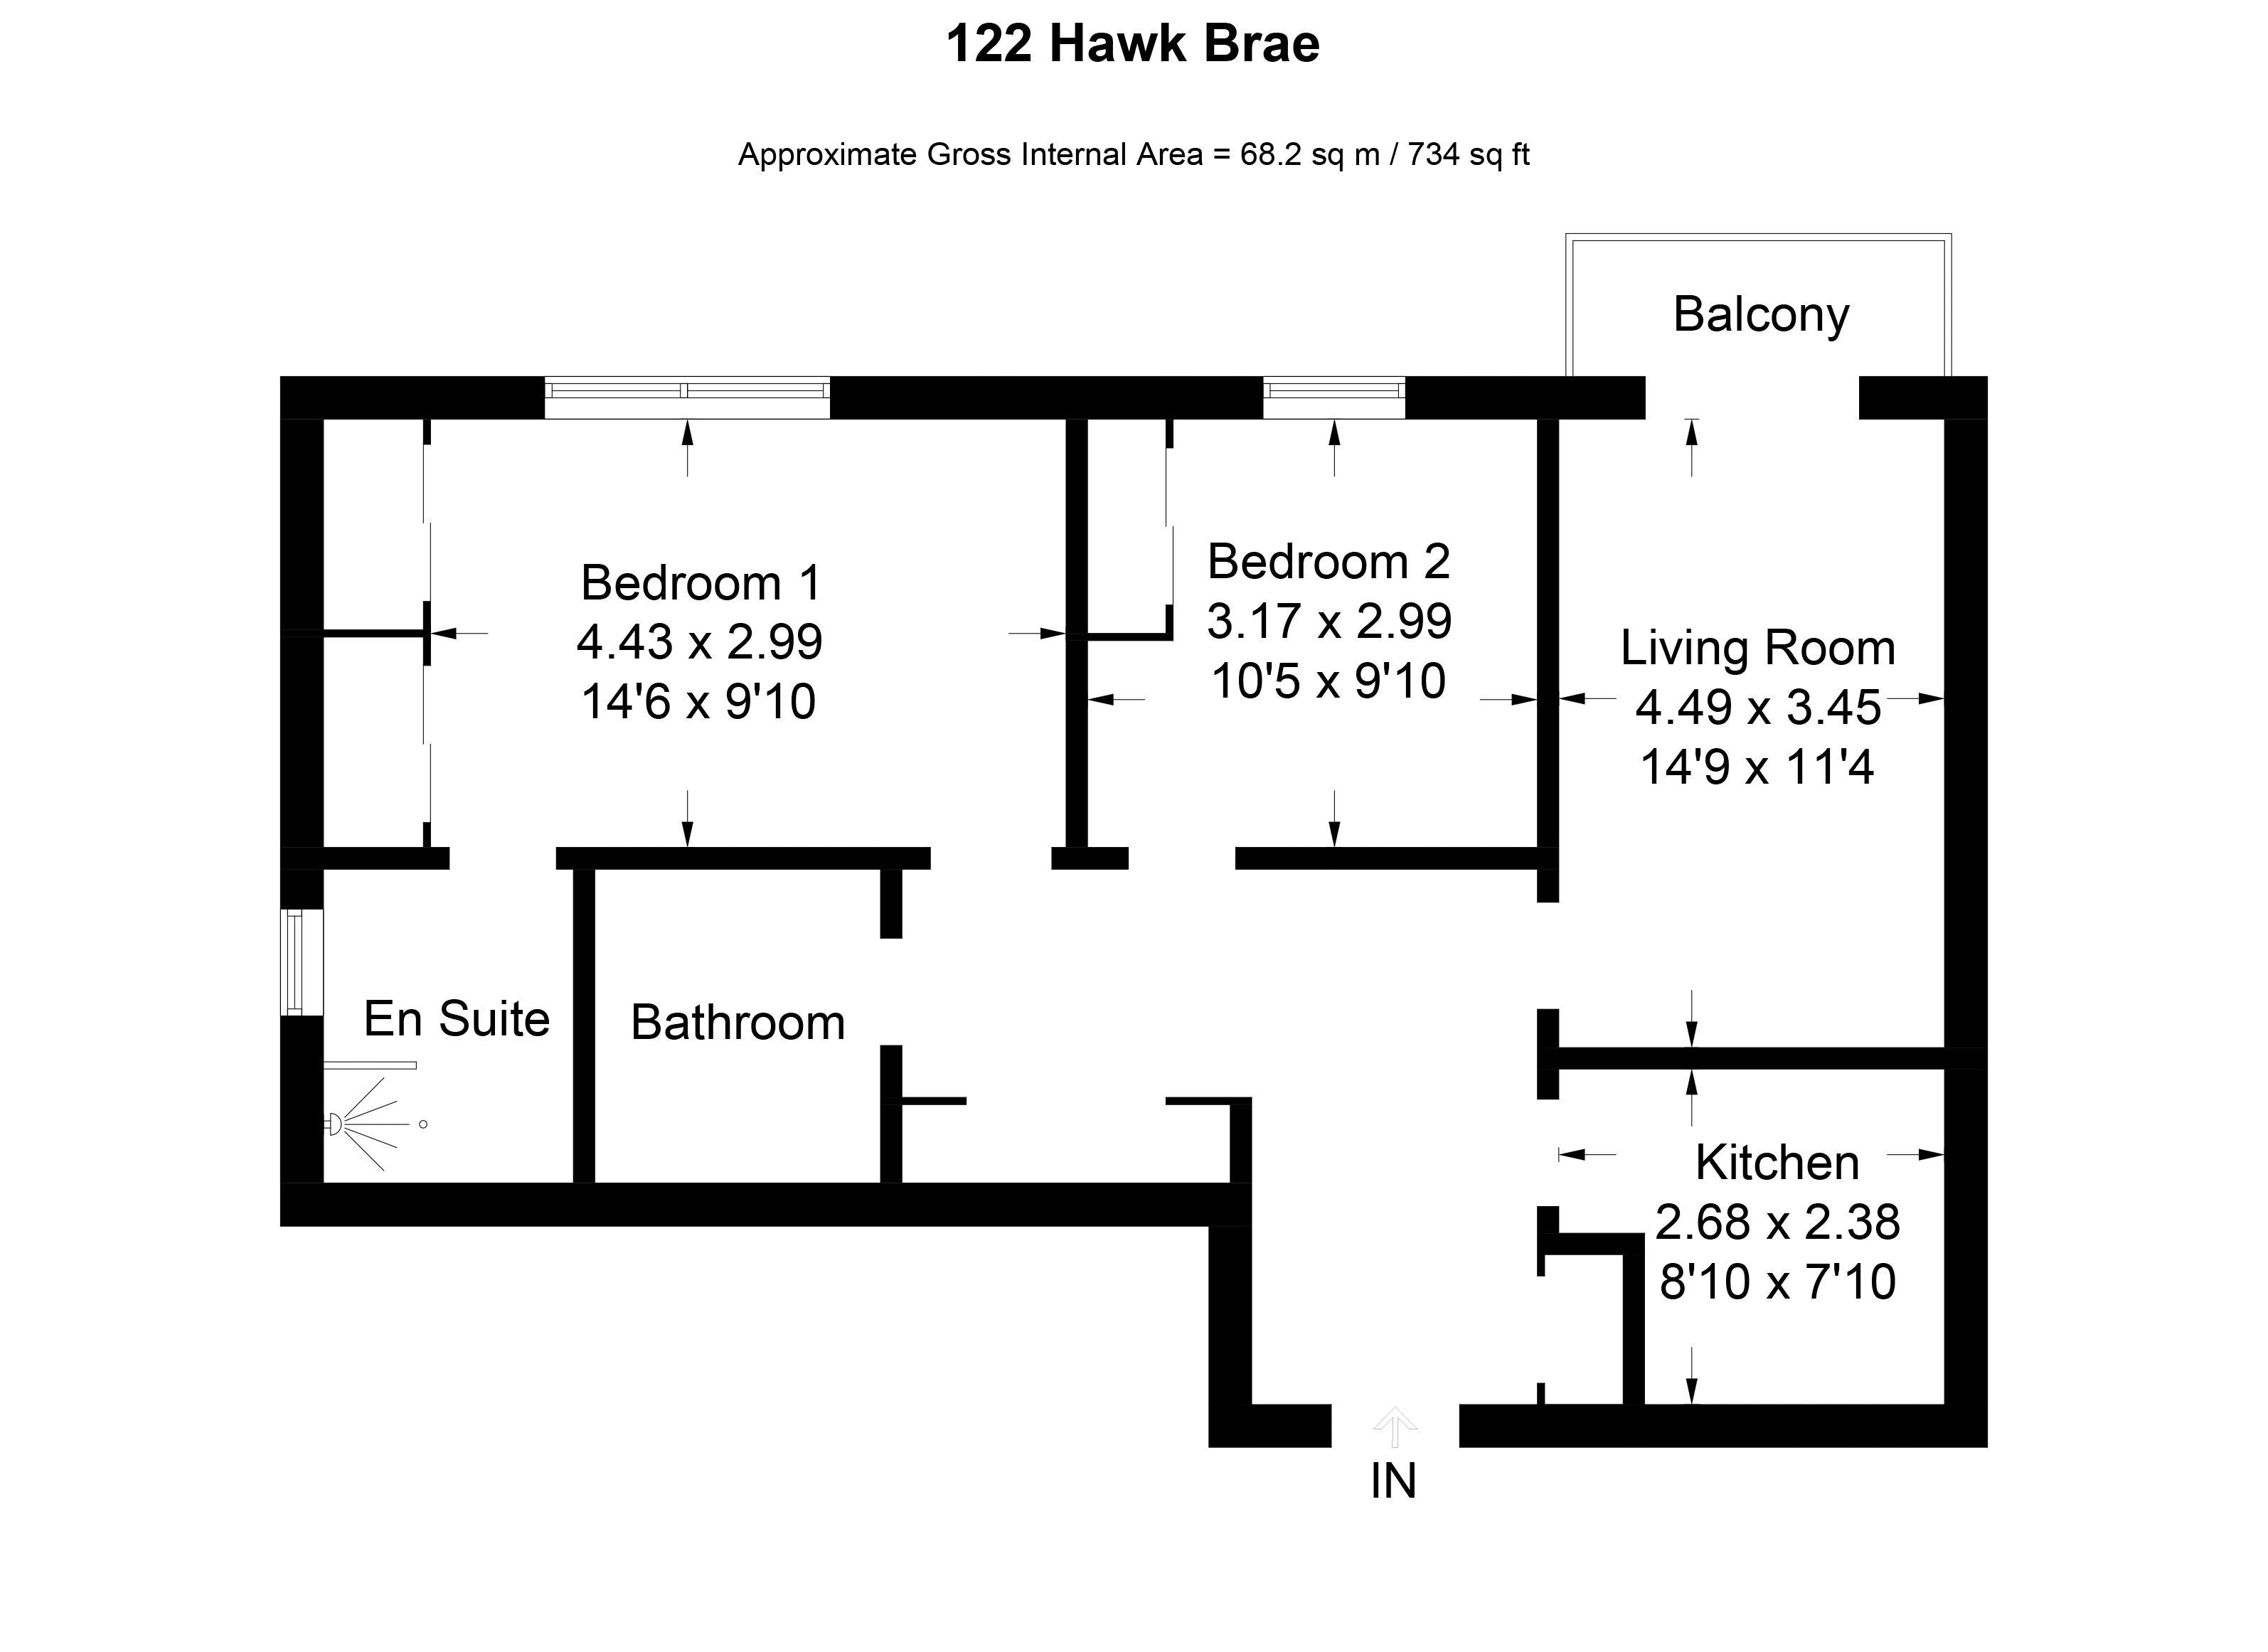 Hawk Brae